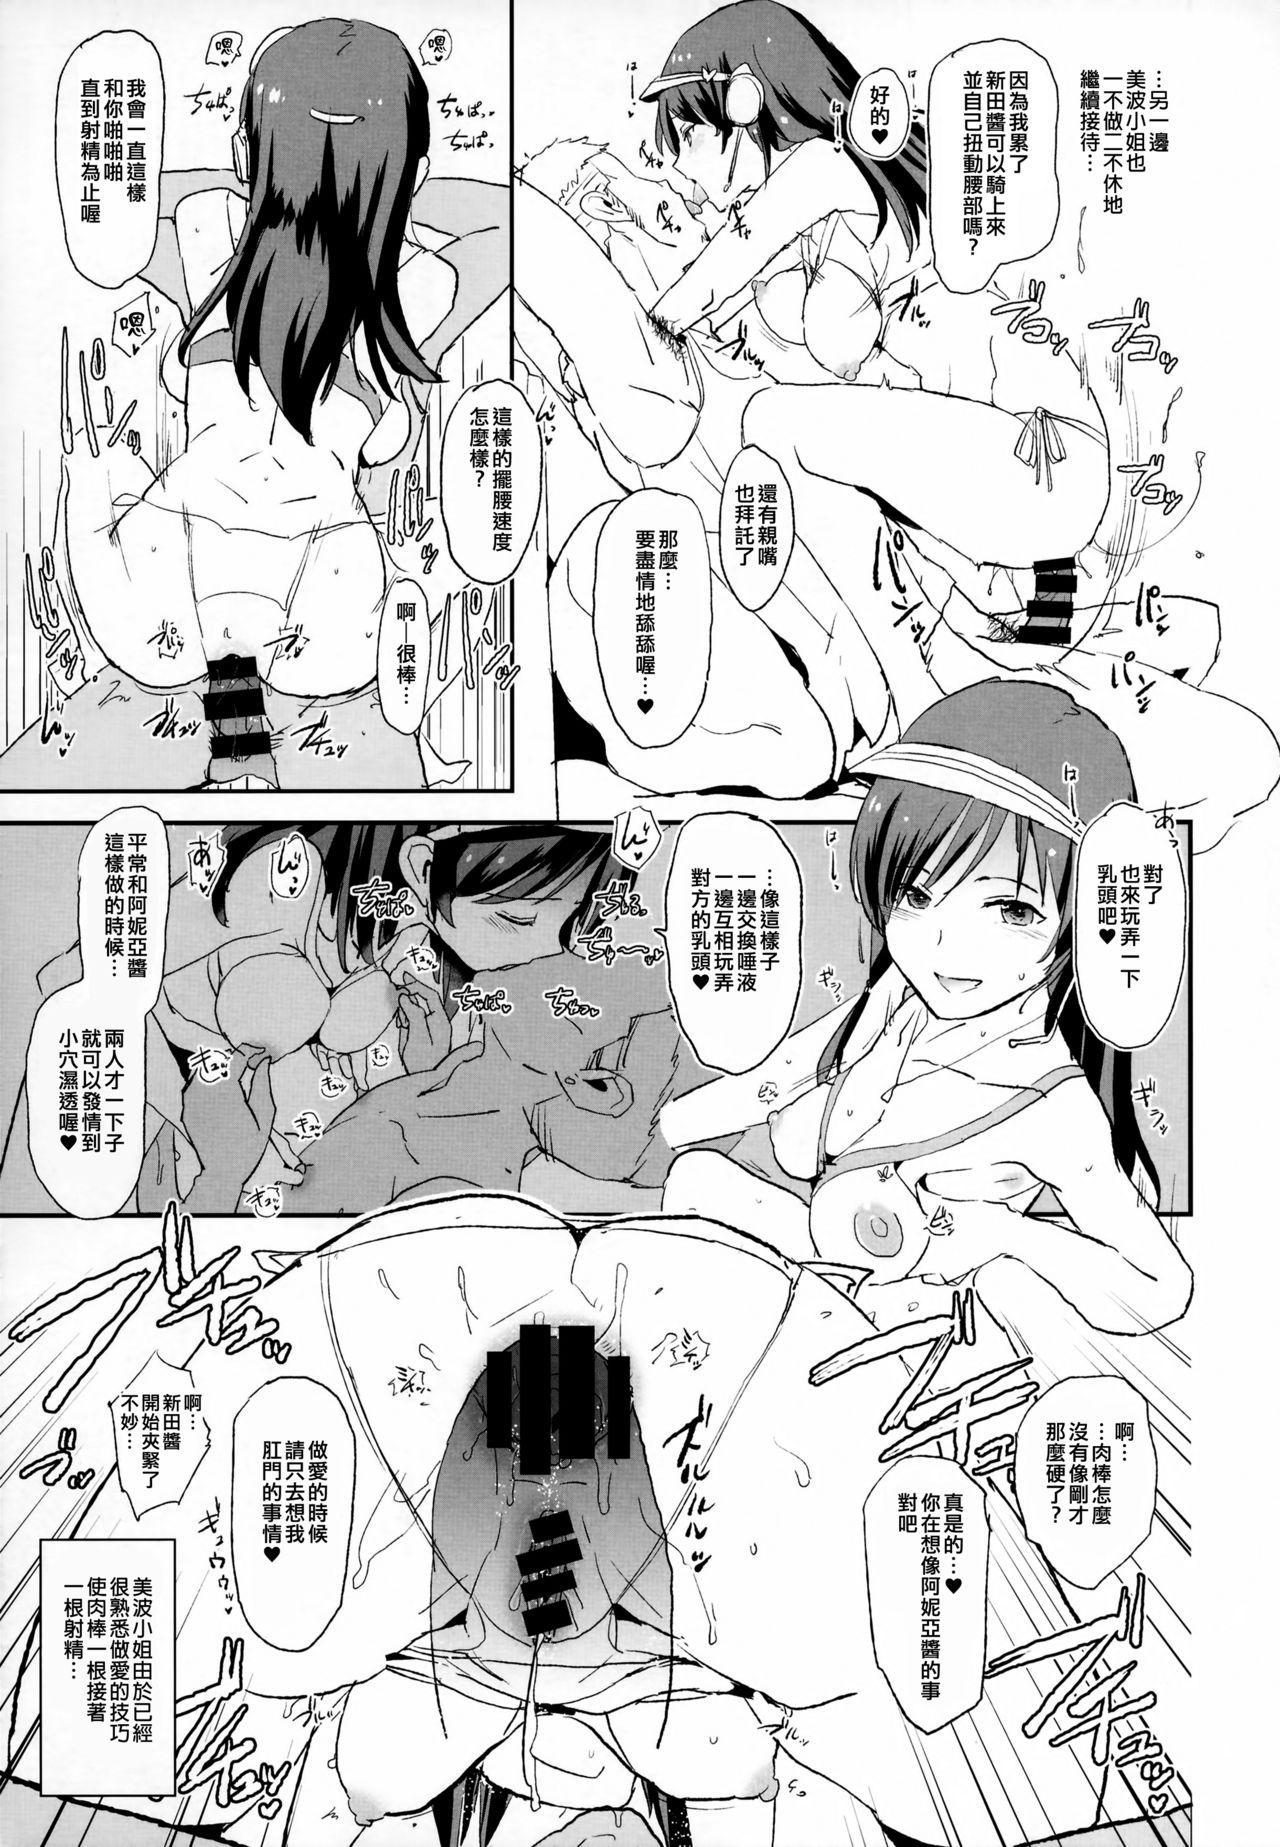 Sagisawa Fumika no Saimin Dosukebe Settai Party with Tachibana Arisu to Nitta Minami + Omake Paper 18